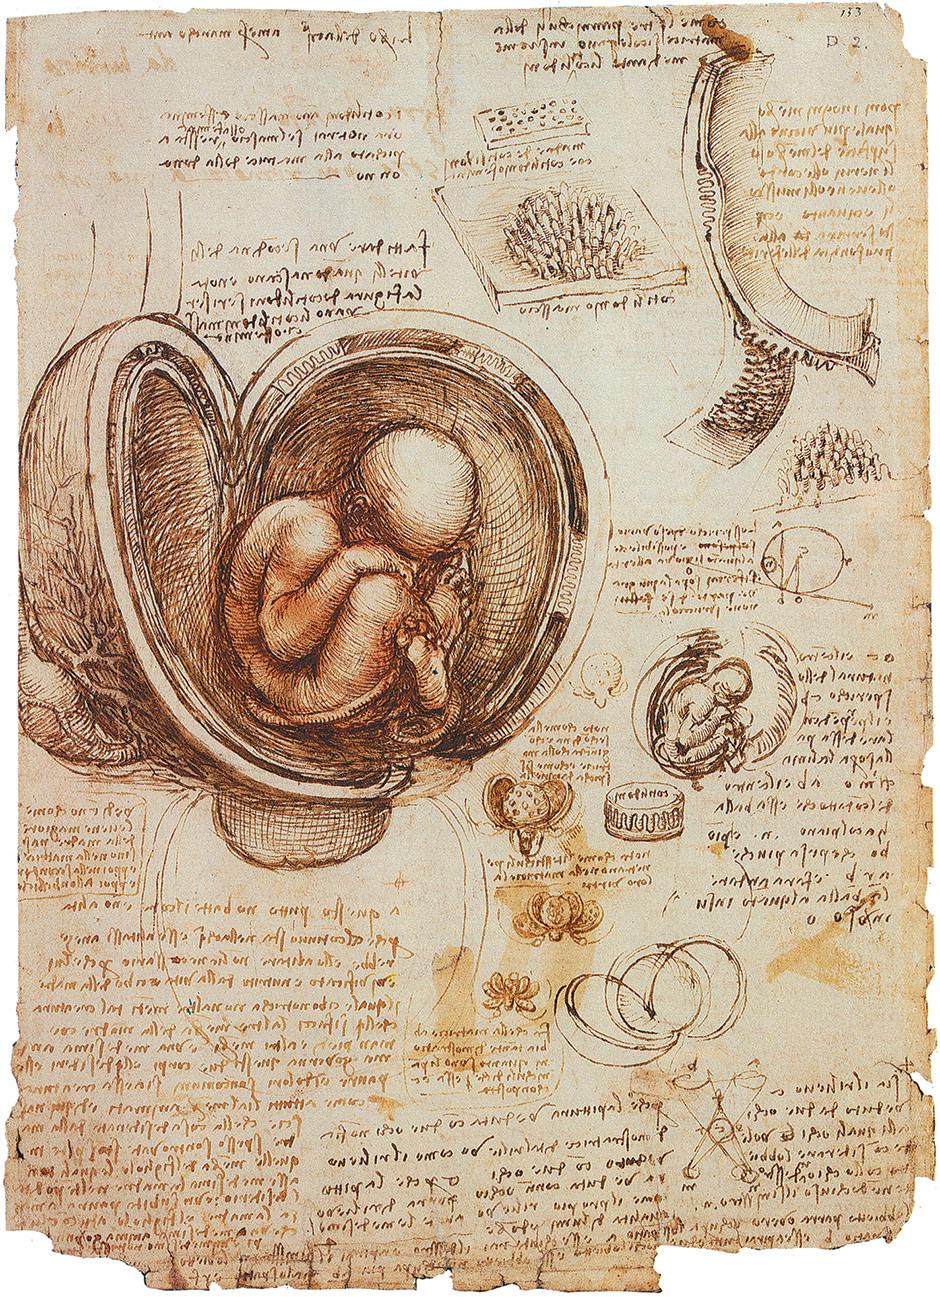 Leonardo Da Vinci: The Fetus and the Linings of the Uterus, circa 1511–1513